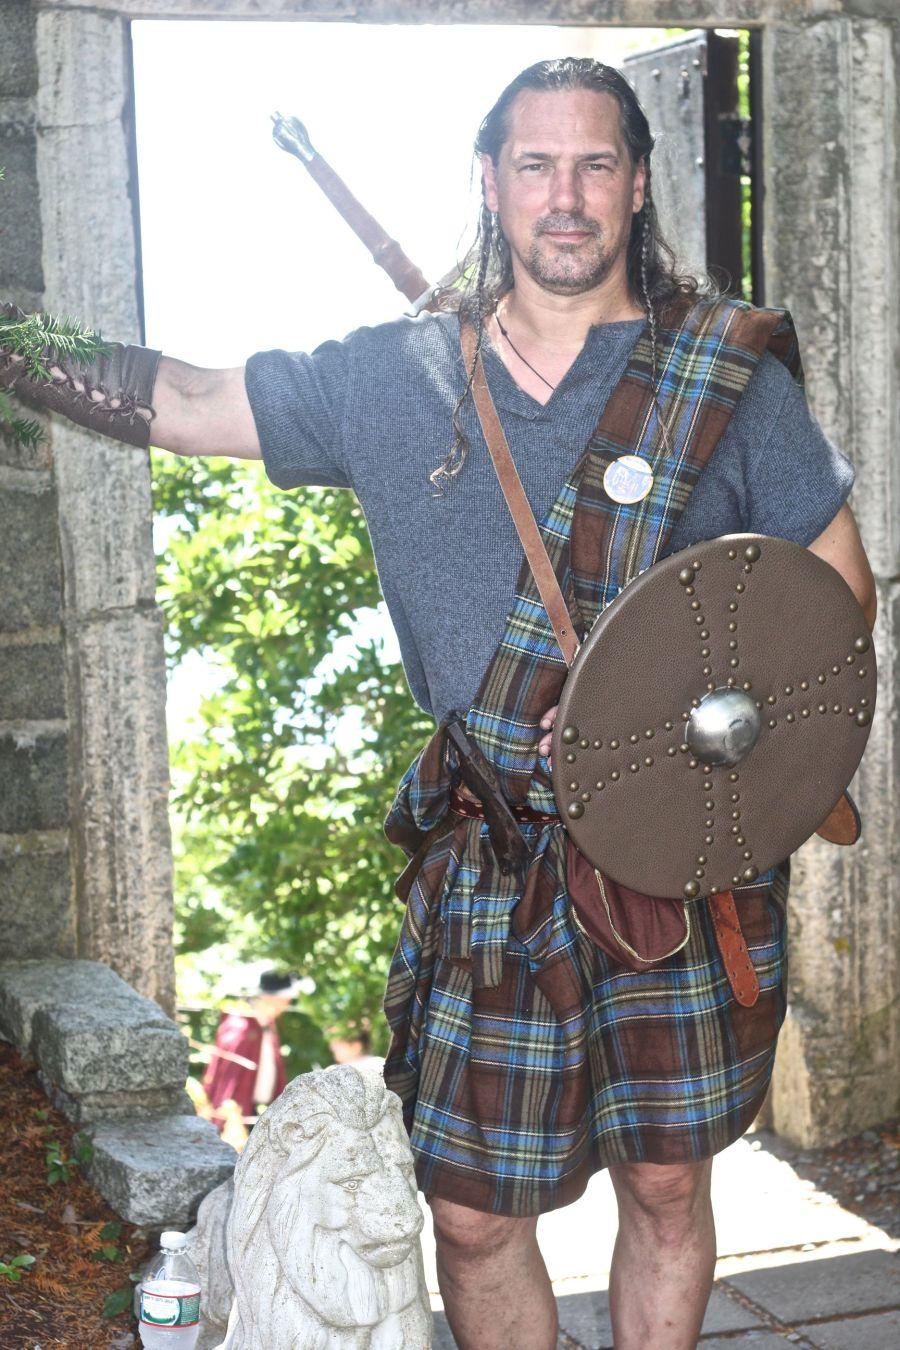 gloucester hammond castle renaissance fair man in quilt with shield